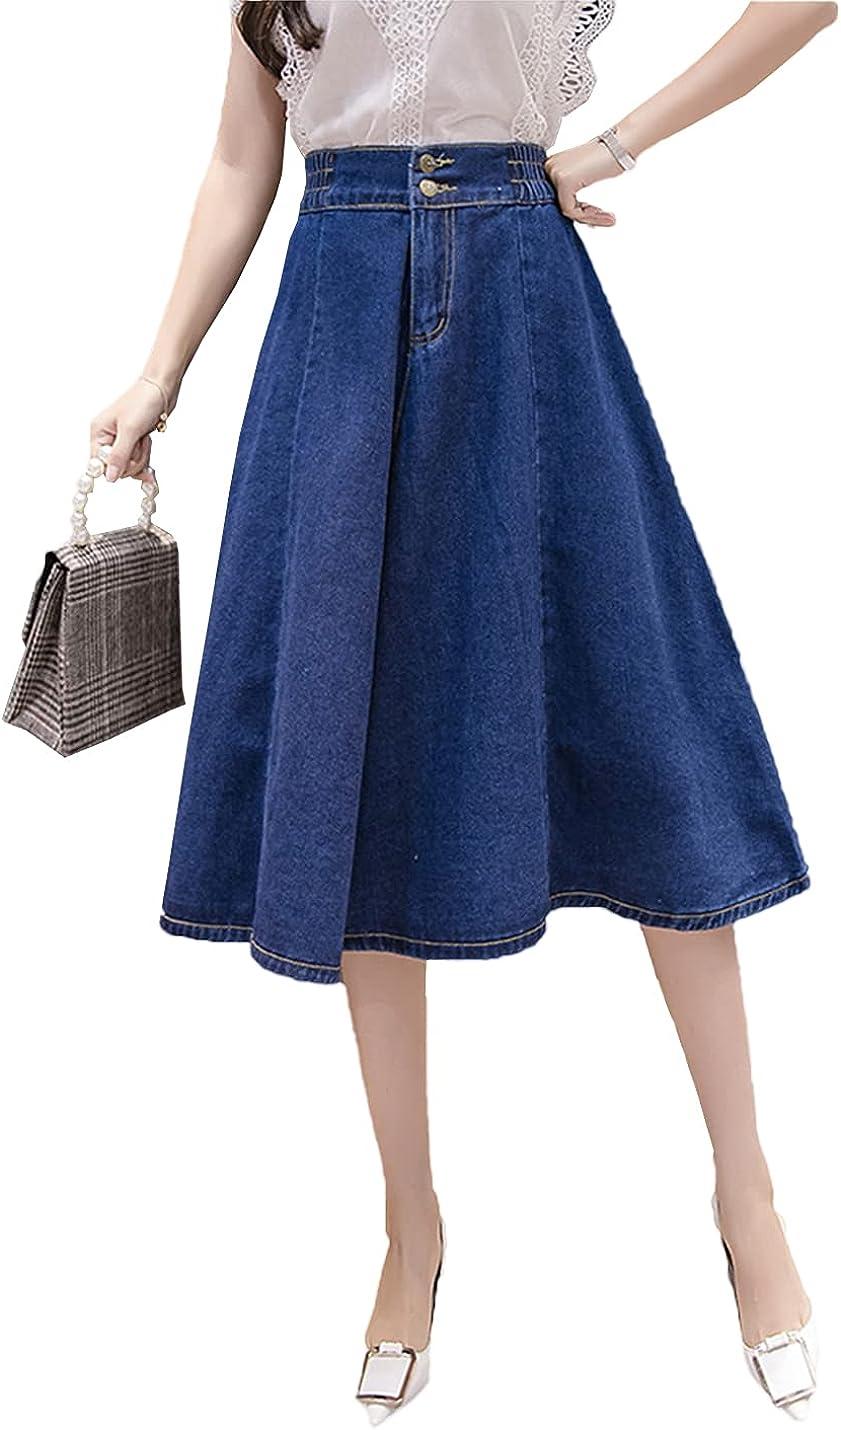 IKIIO Women's Casual Summer High Waist Loose Fit Flared Skirts Elastic Waist Denim Skirt